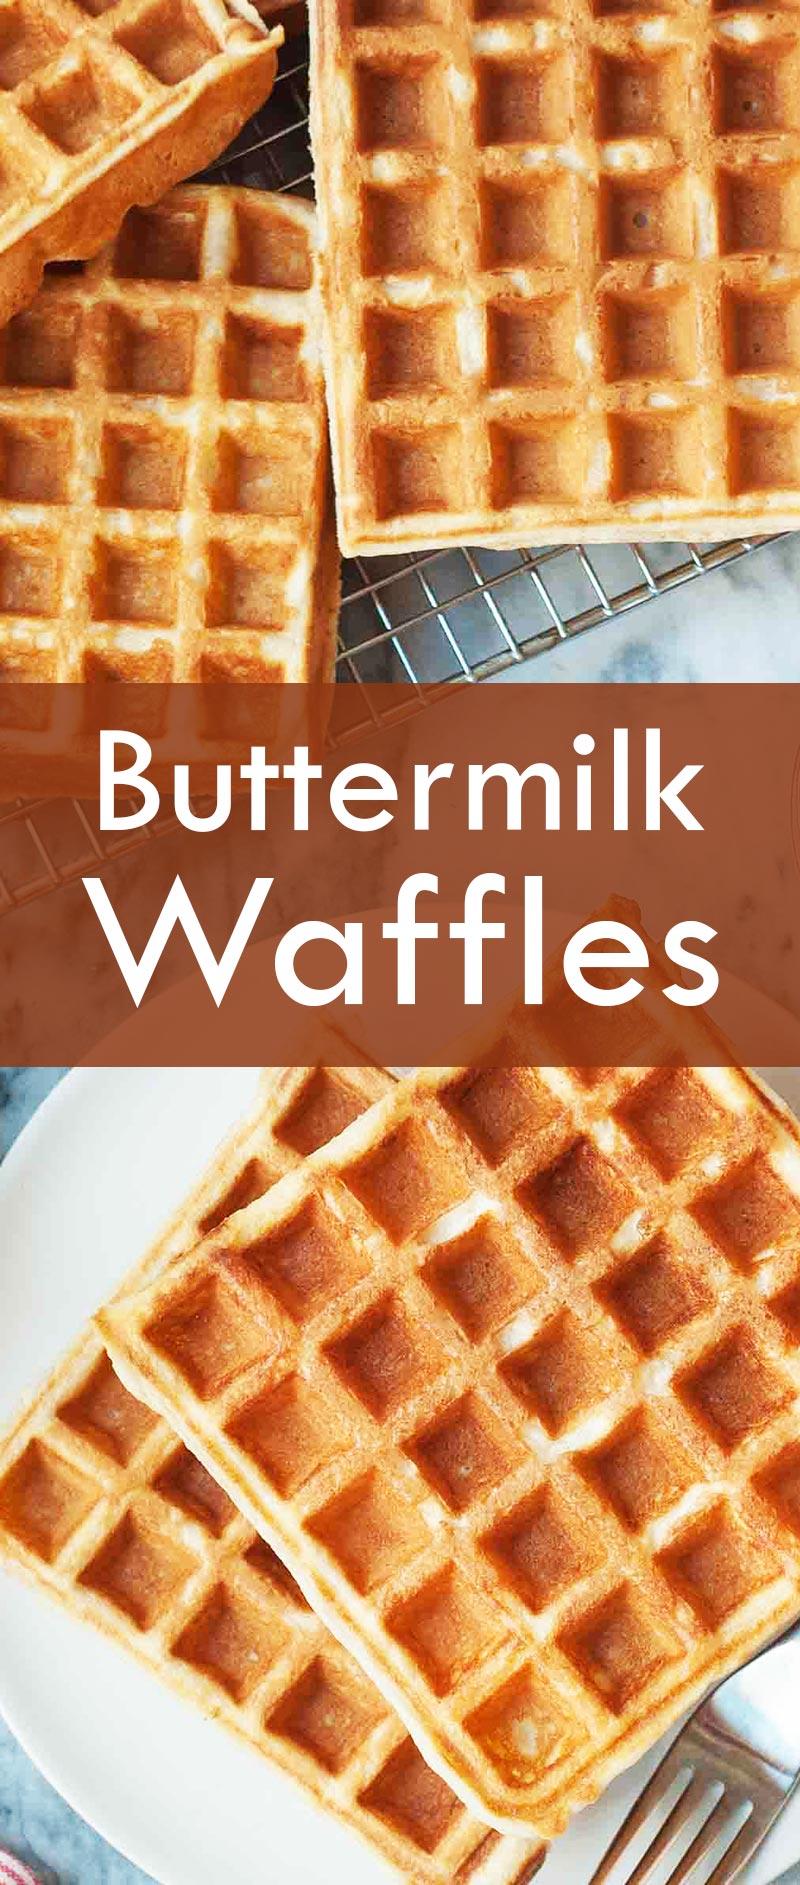 Buttermilk Waffle Recipe An Easy Classic Simplyrecipes Com Recipe Buttermilk Waffles Waffle Recipes Buttermilk Waffles Recipe